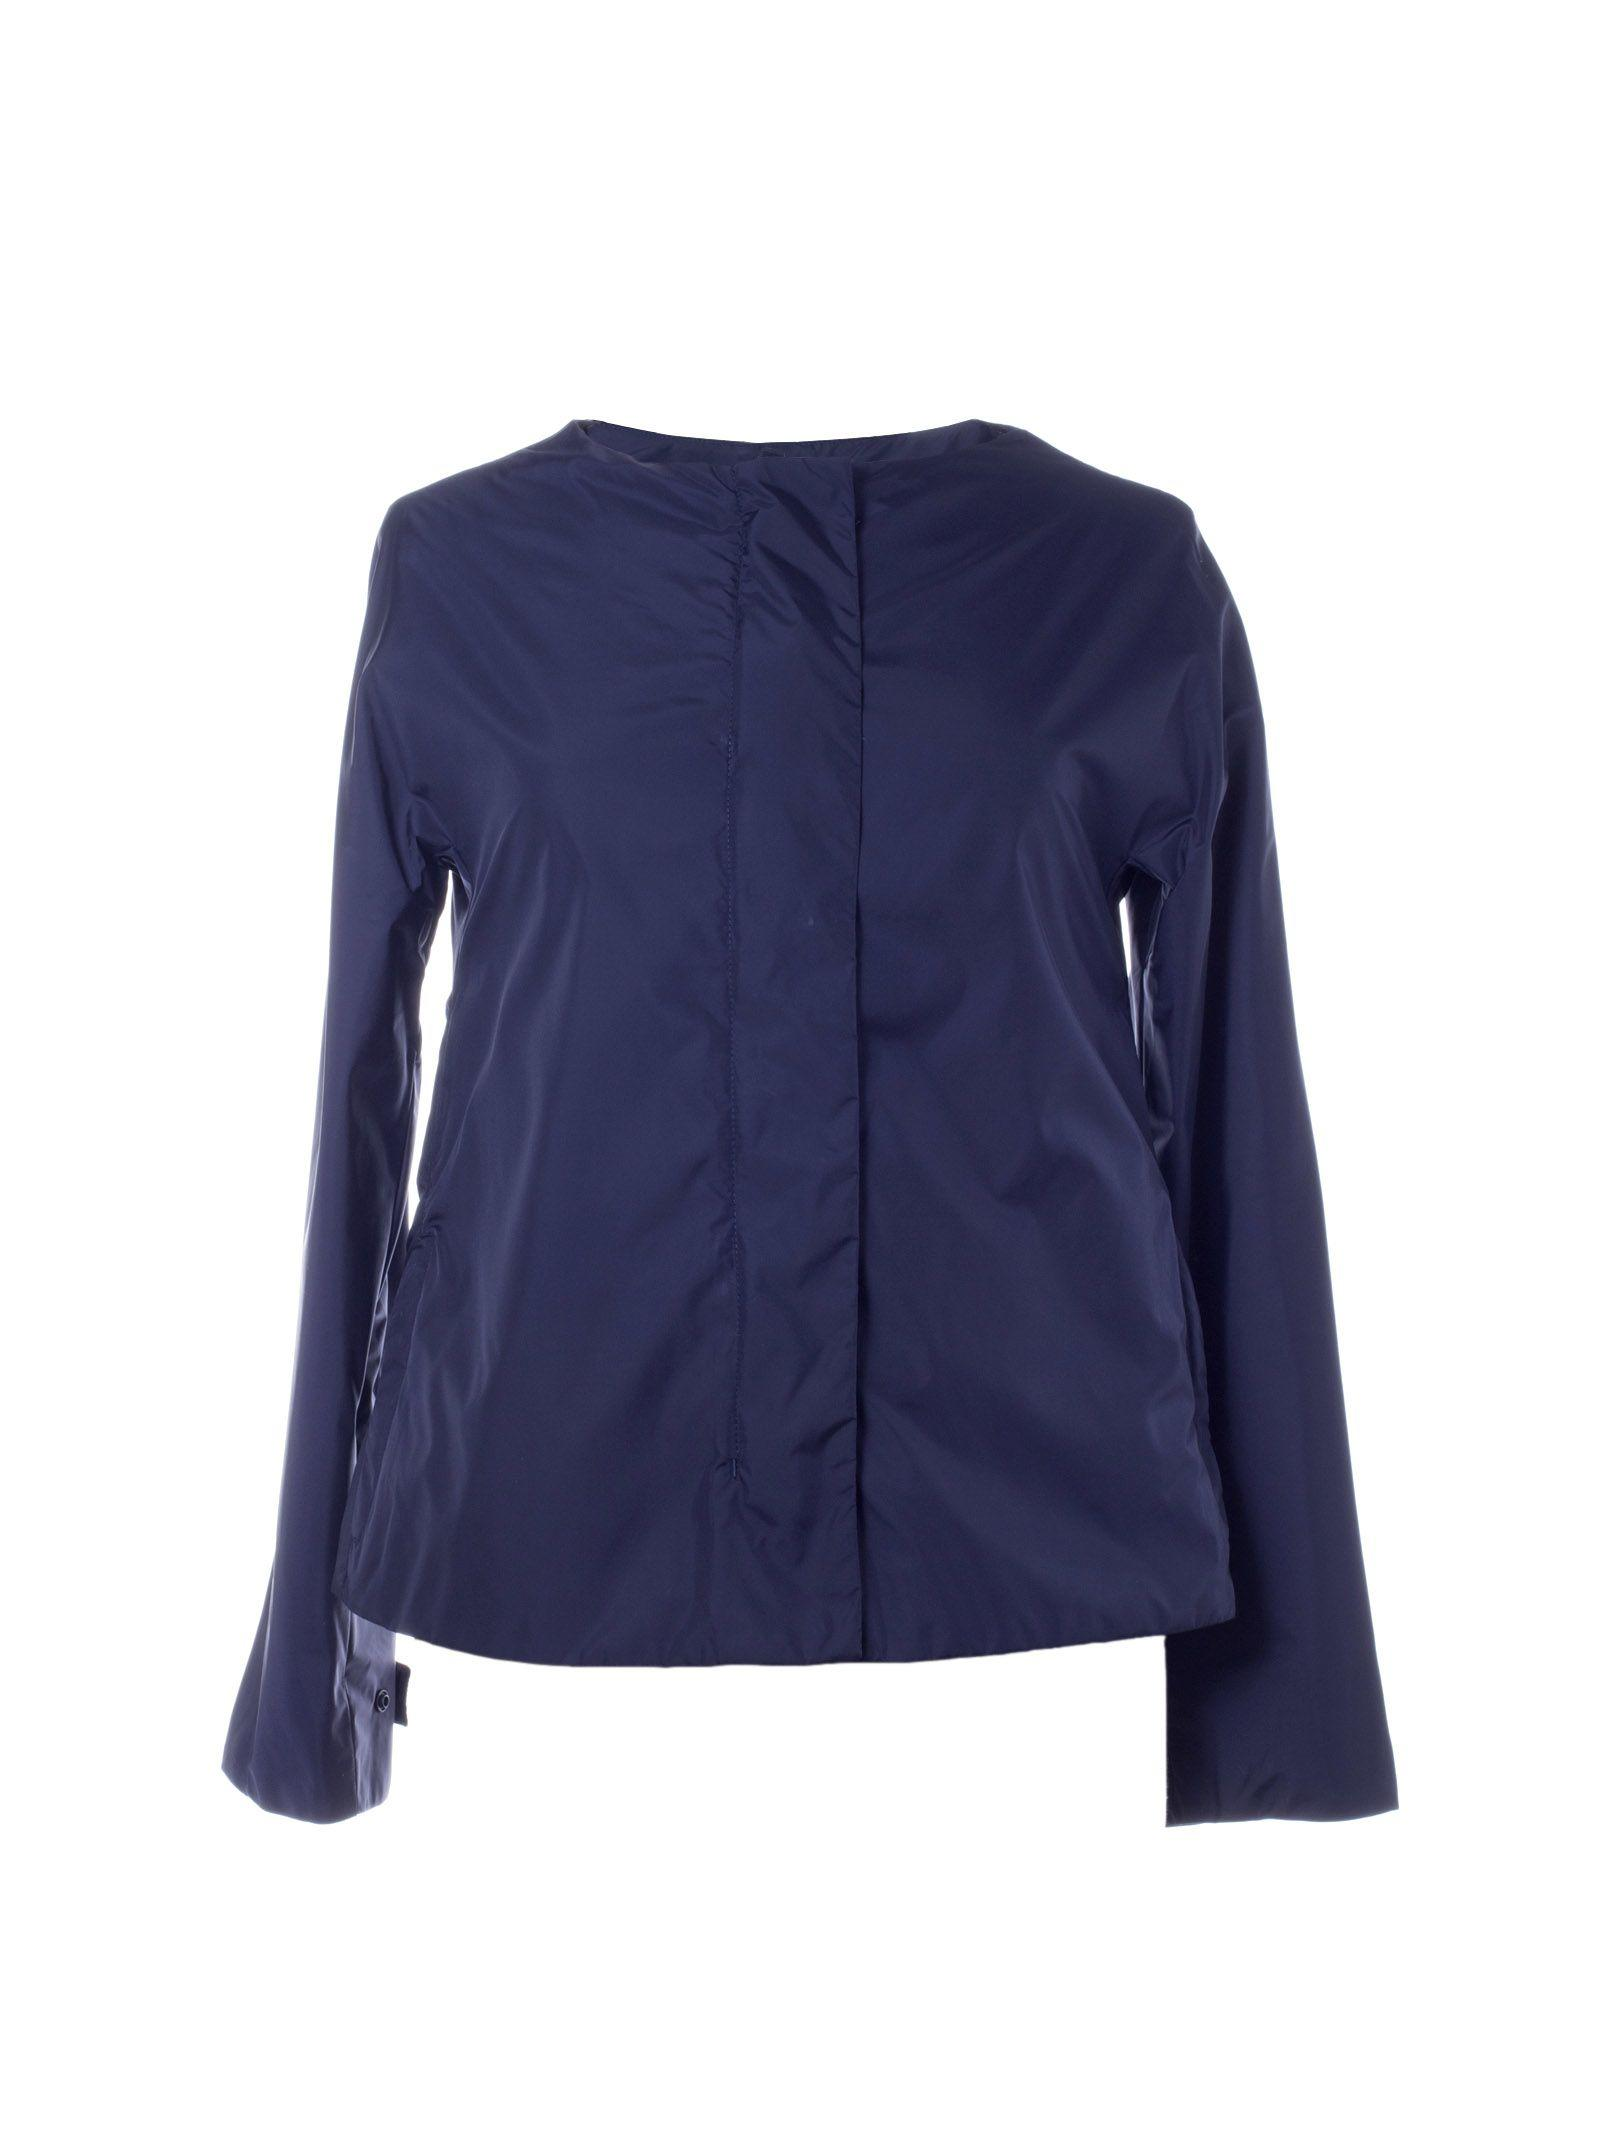 Aspesi Fontina Jacket In Navy Blue